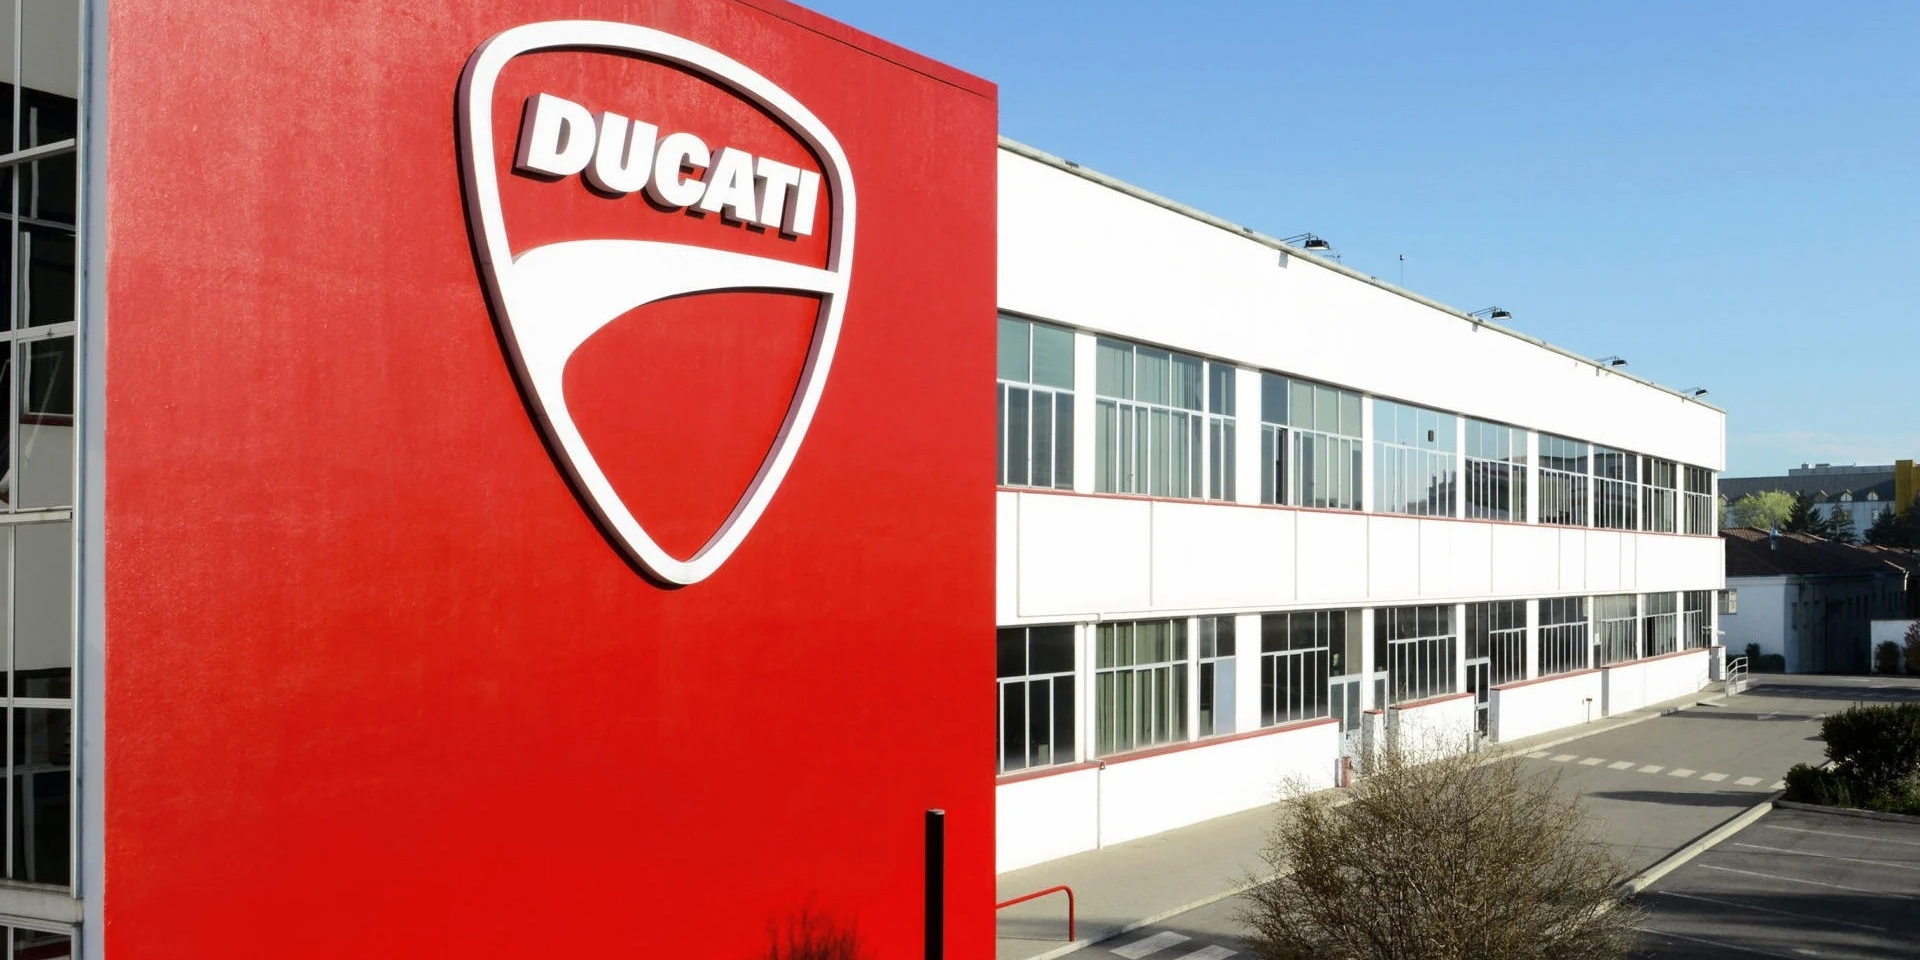 前途無光?Volkswagen打算出售Ducati、Bugatti以及Lamborghini!